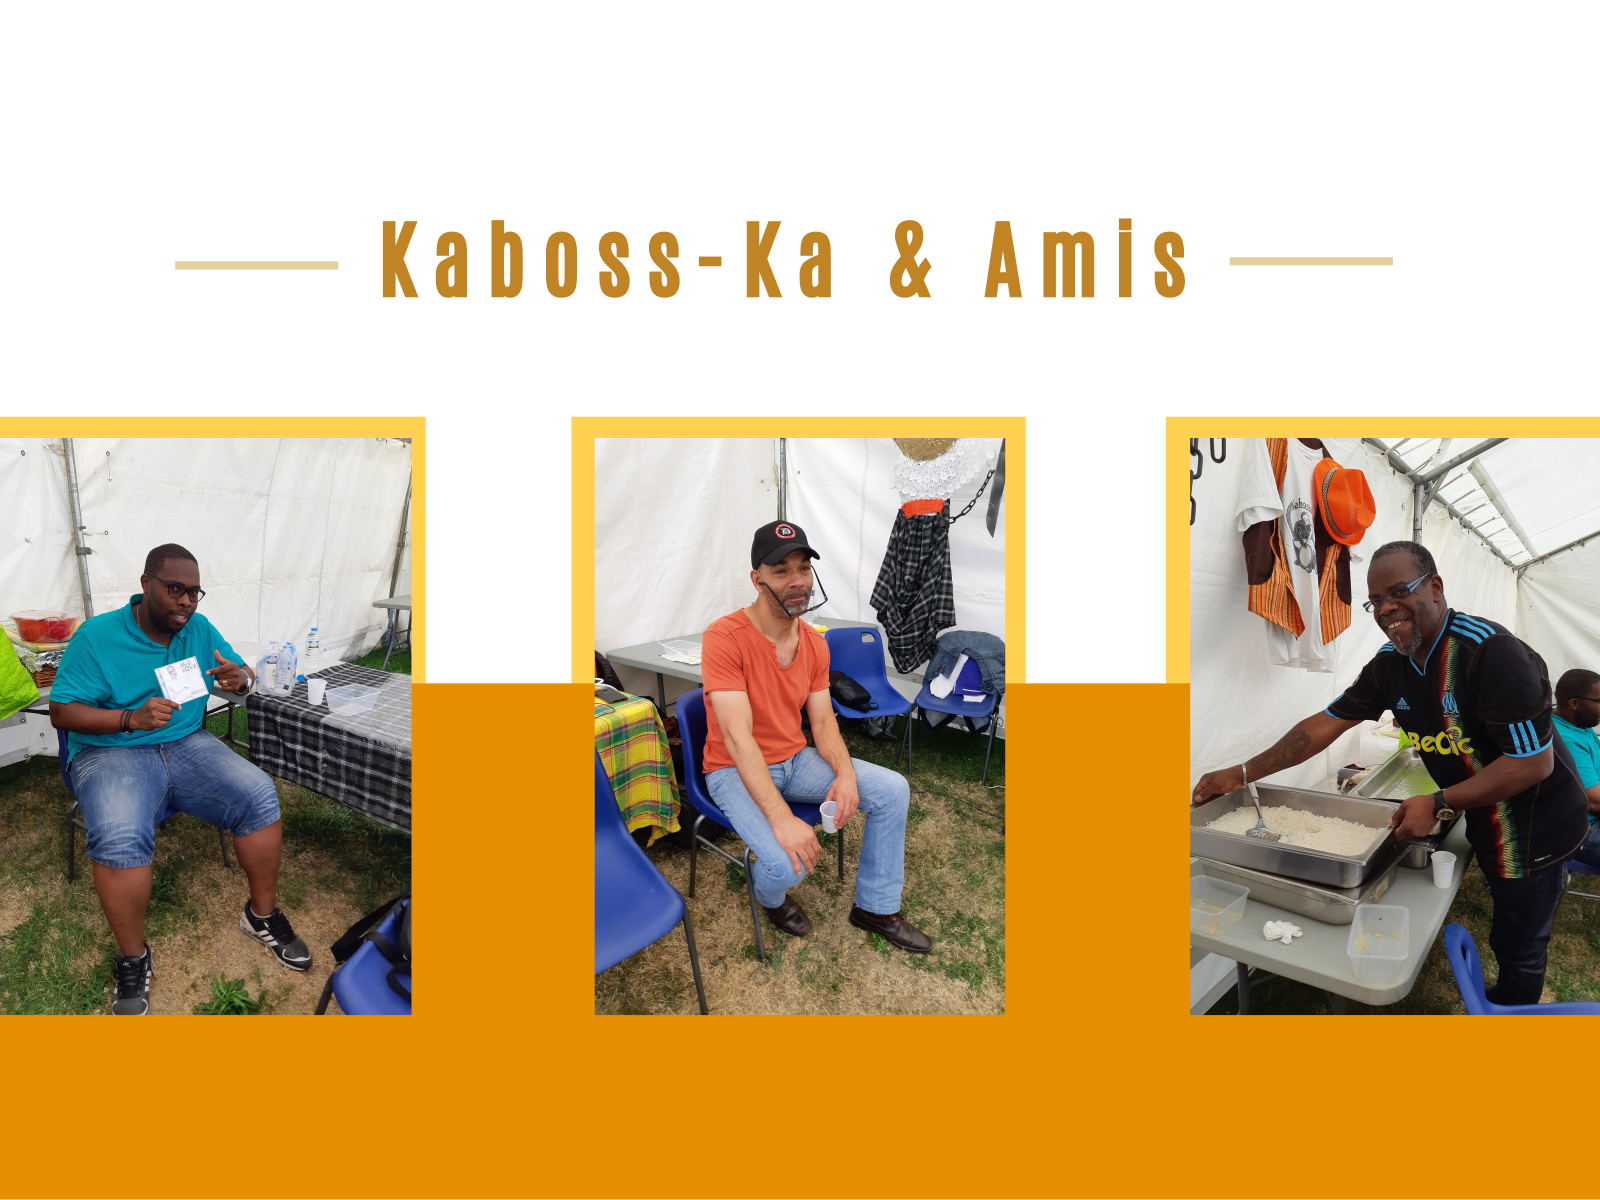 KABOSS-KA et AMIS 4